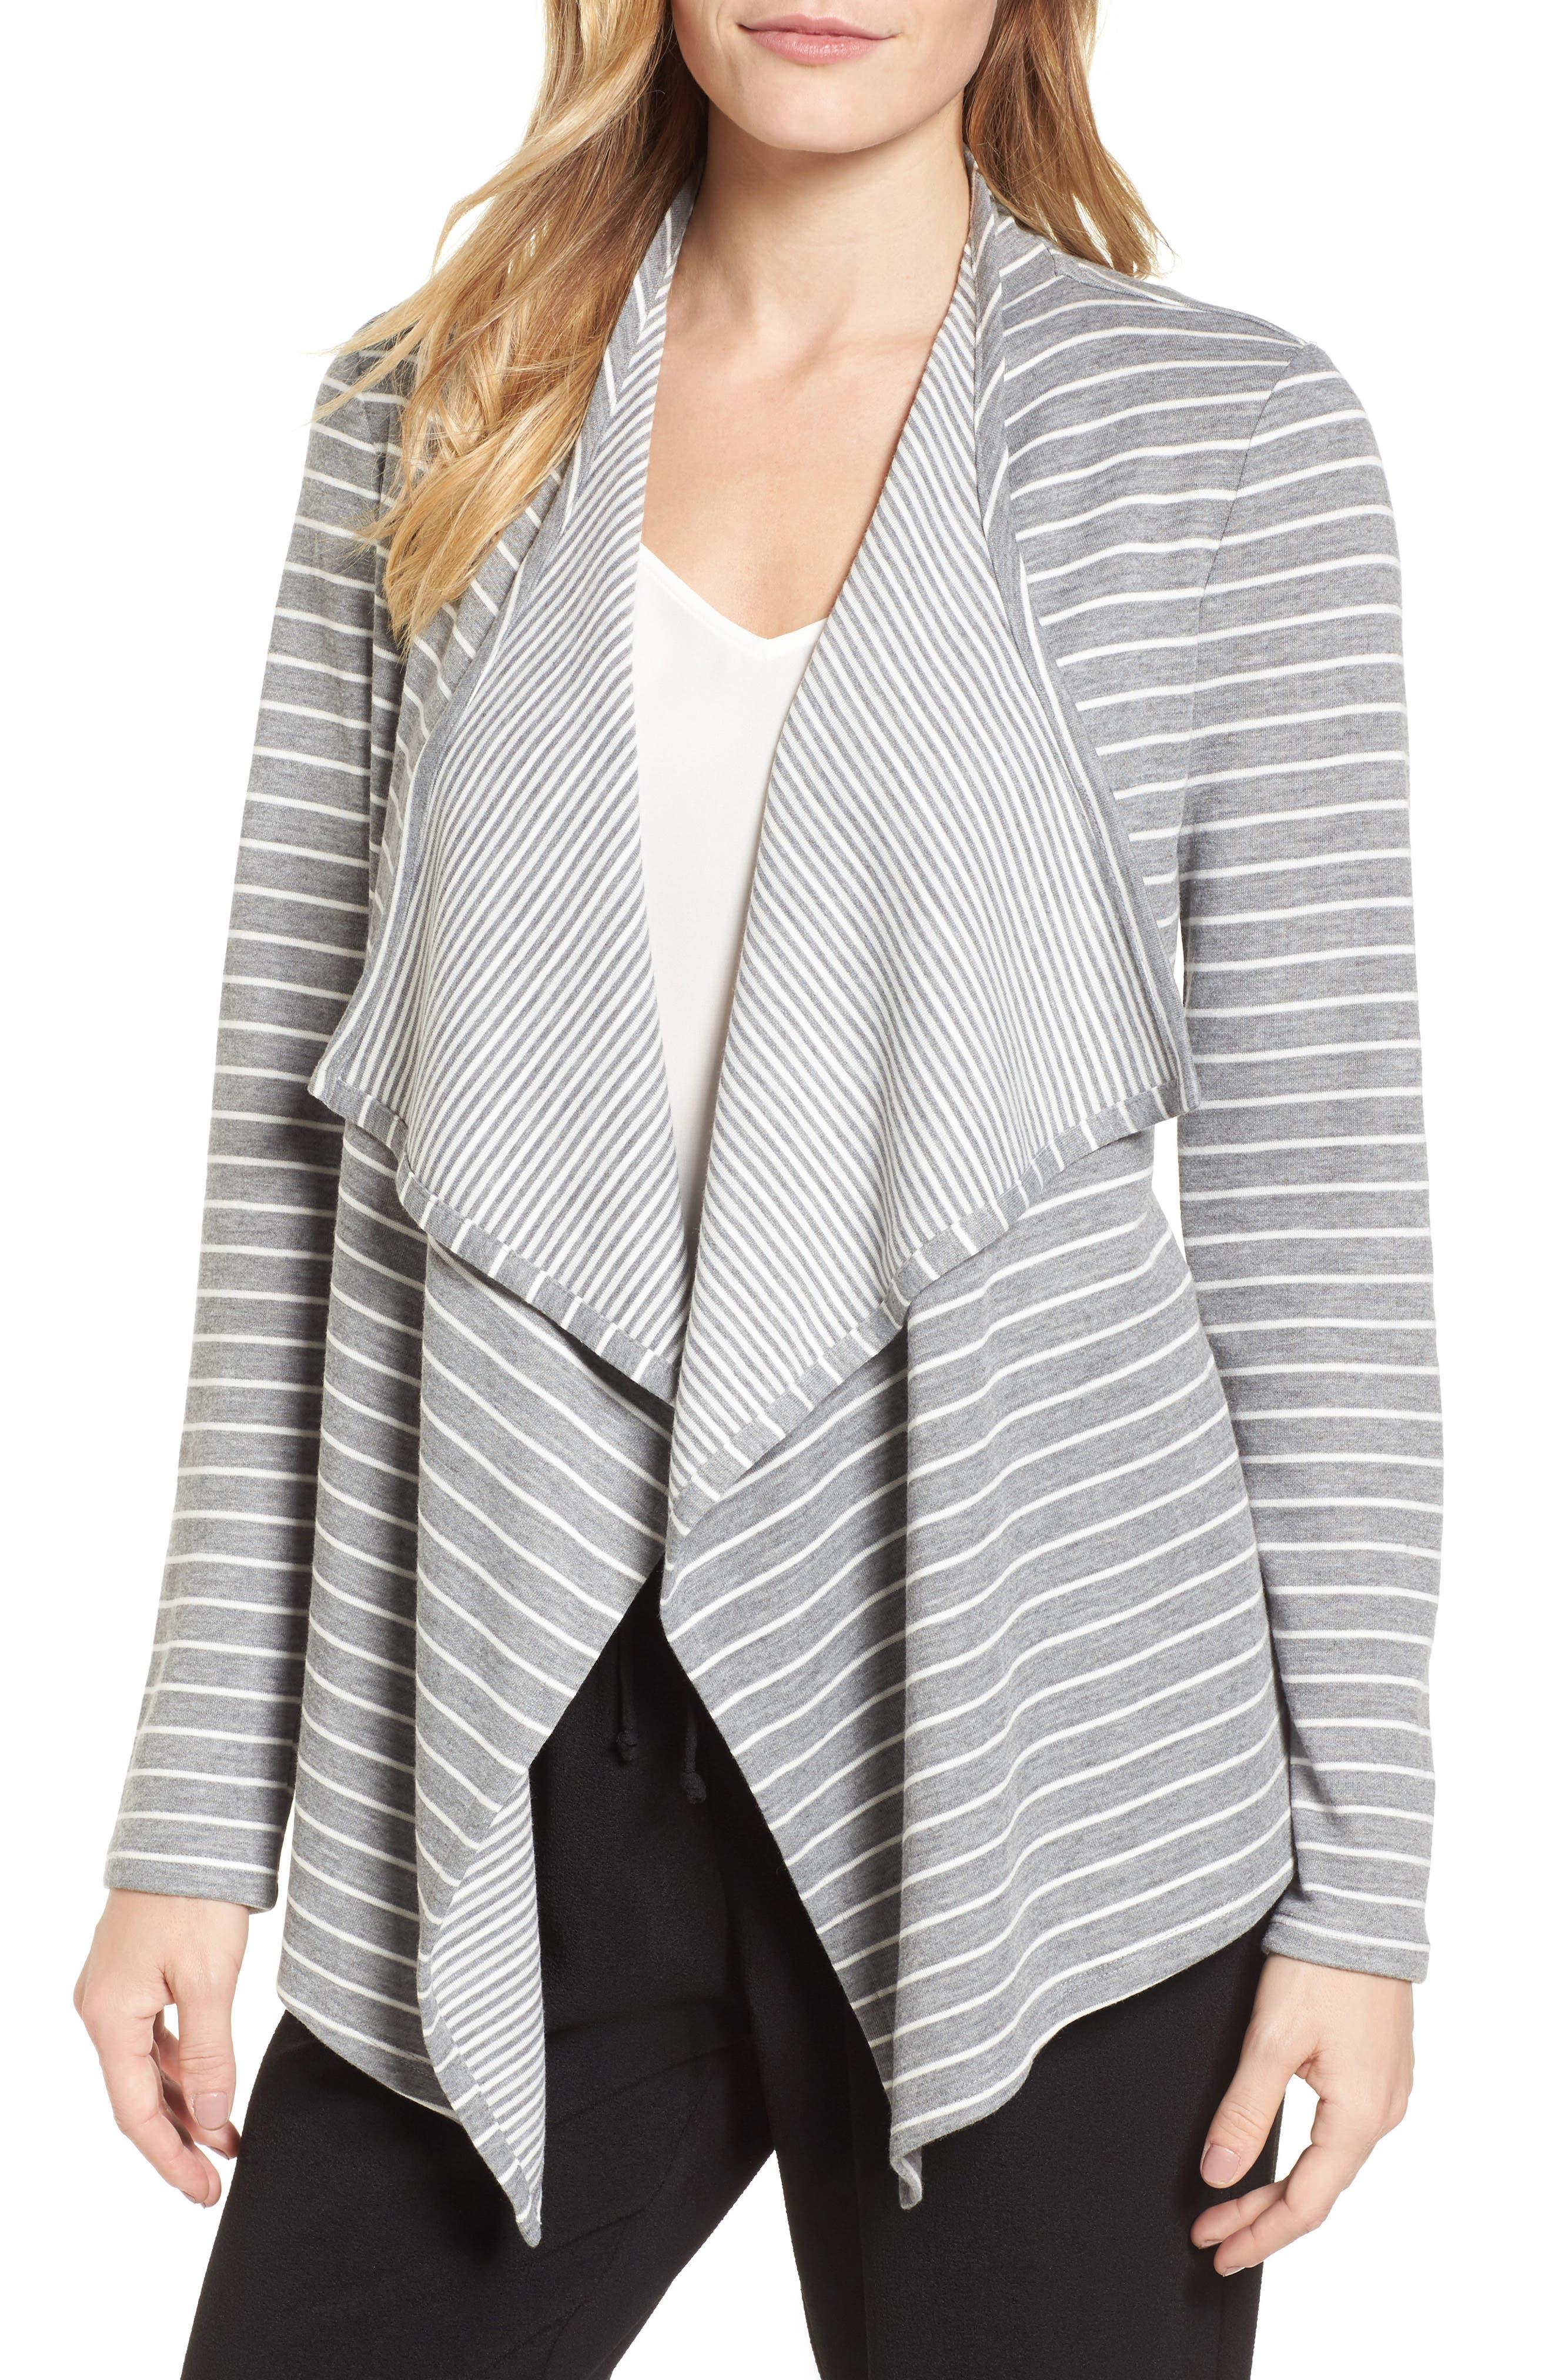 Mixed Stripe Cardigan,                         Main,                         color, 050-Grey Heather